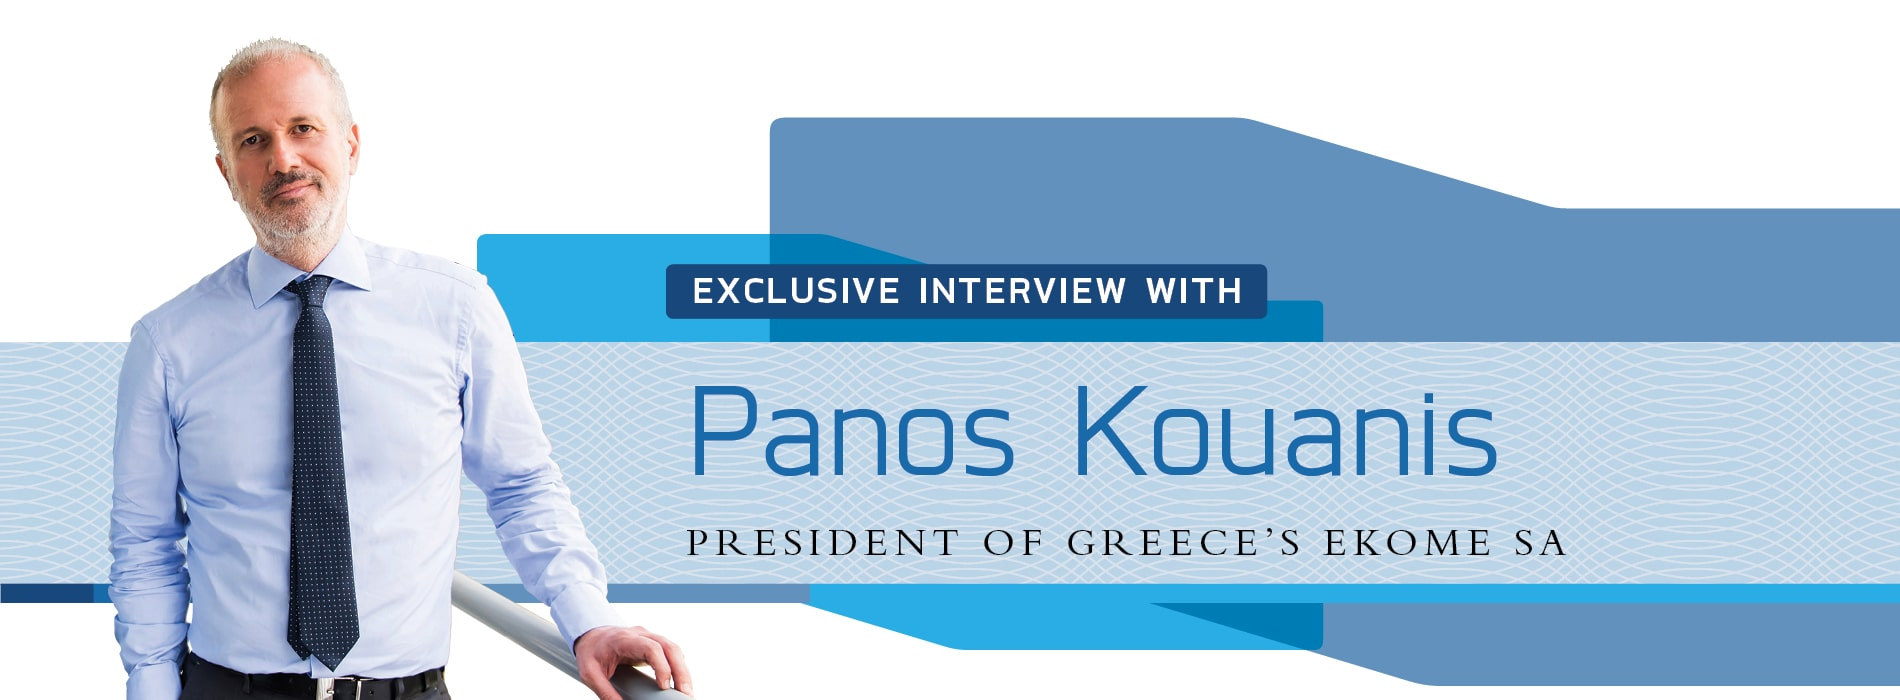 Interview with Panos Kouanis,President of Greece's EKOME SA